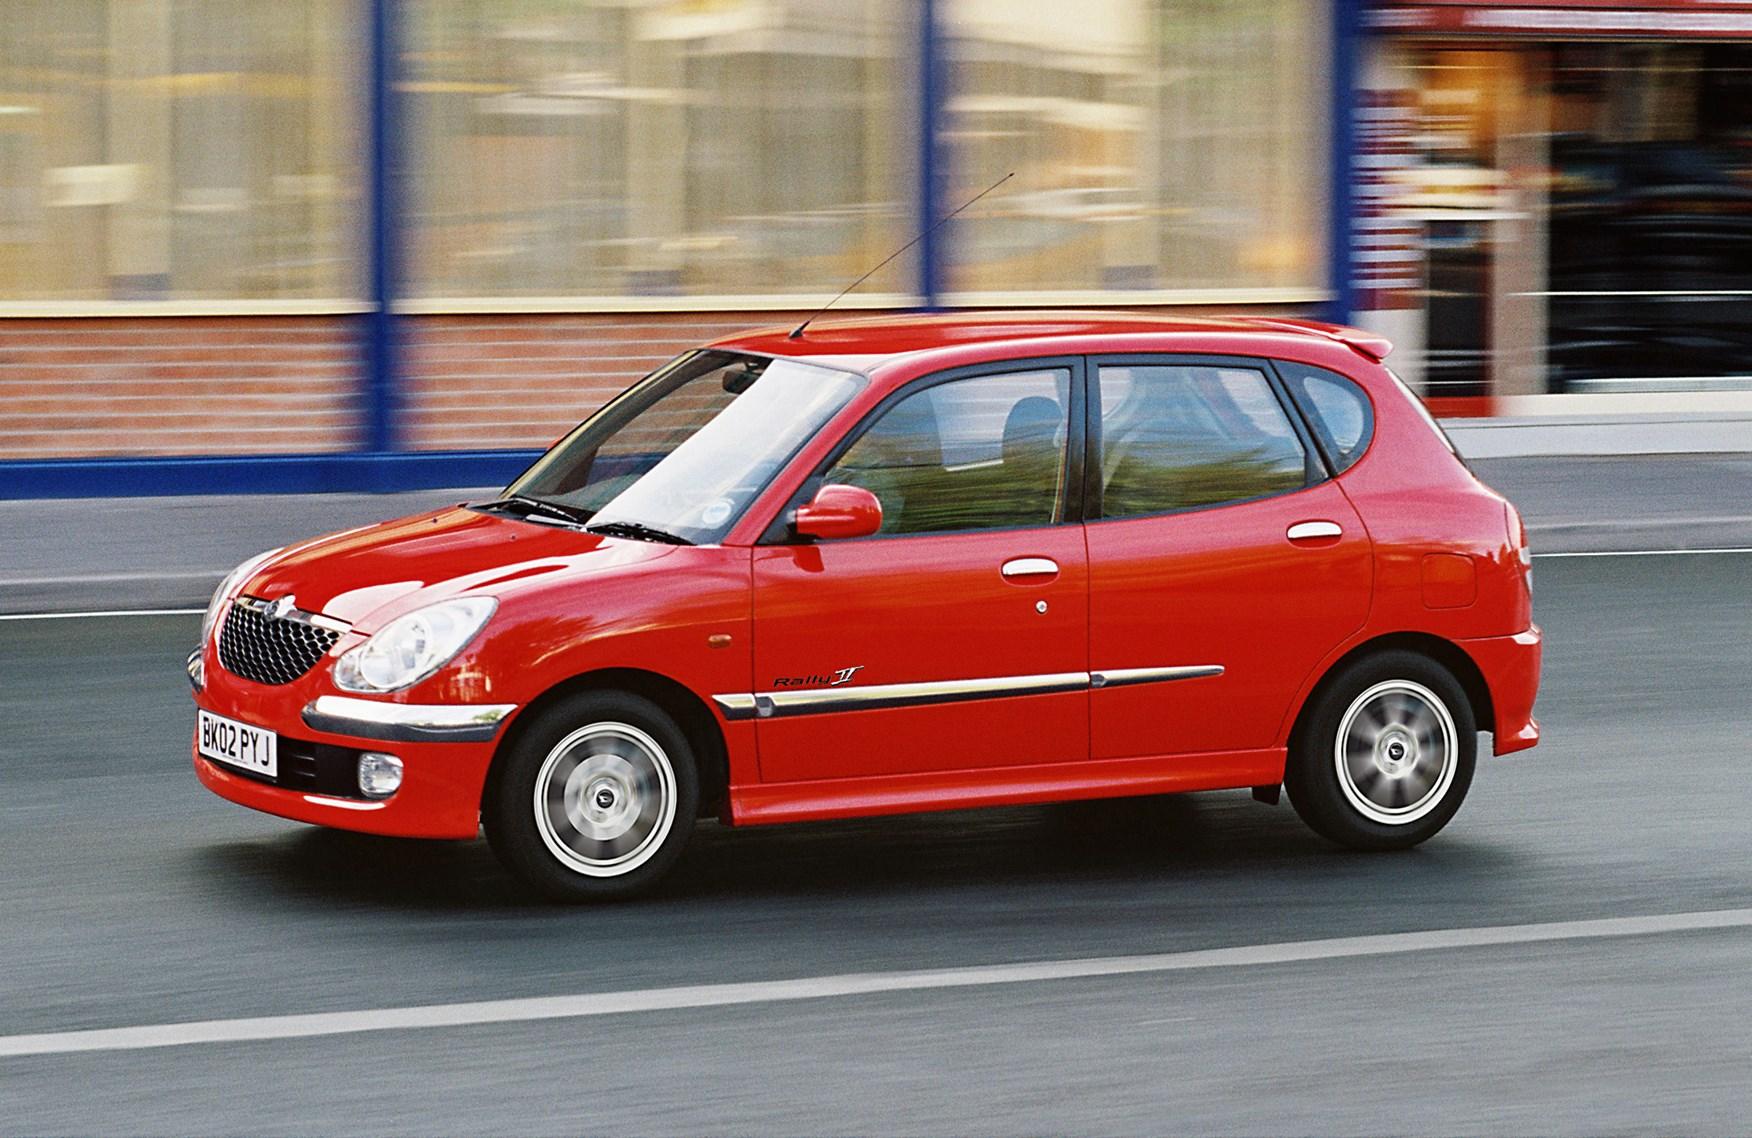 Daihatsu Sirion I (M1) 1998 - 2004 Hatchback 5 door #1